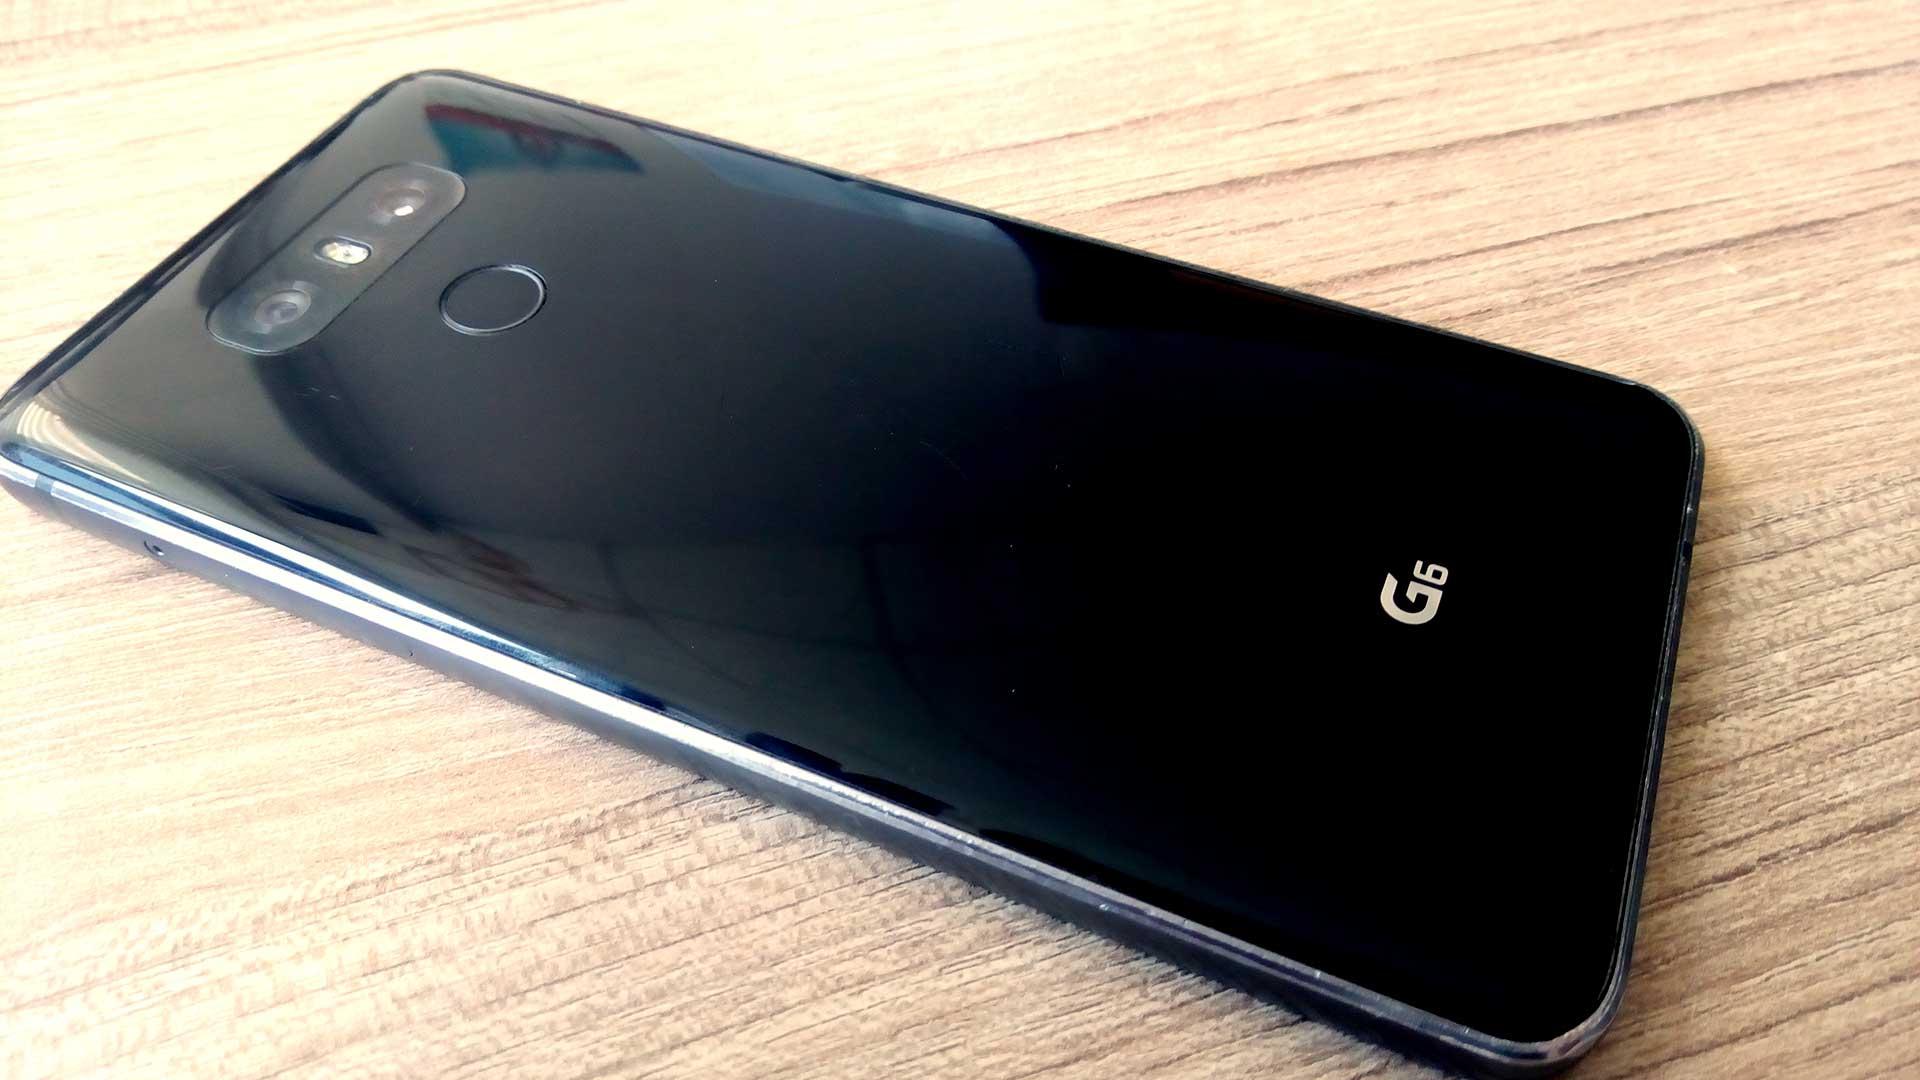 Andoid 9.0 Pie Güncellemesi Alacak Olan LG Telefon Modelleri Açıklandı?fit=thumb&w=418&h=152&q=80